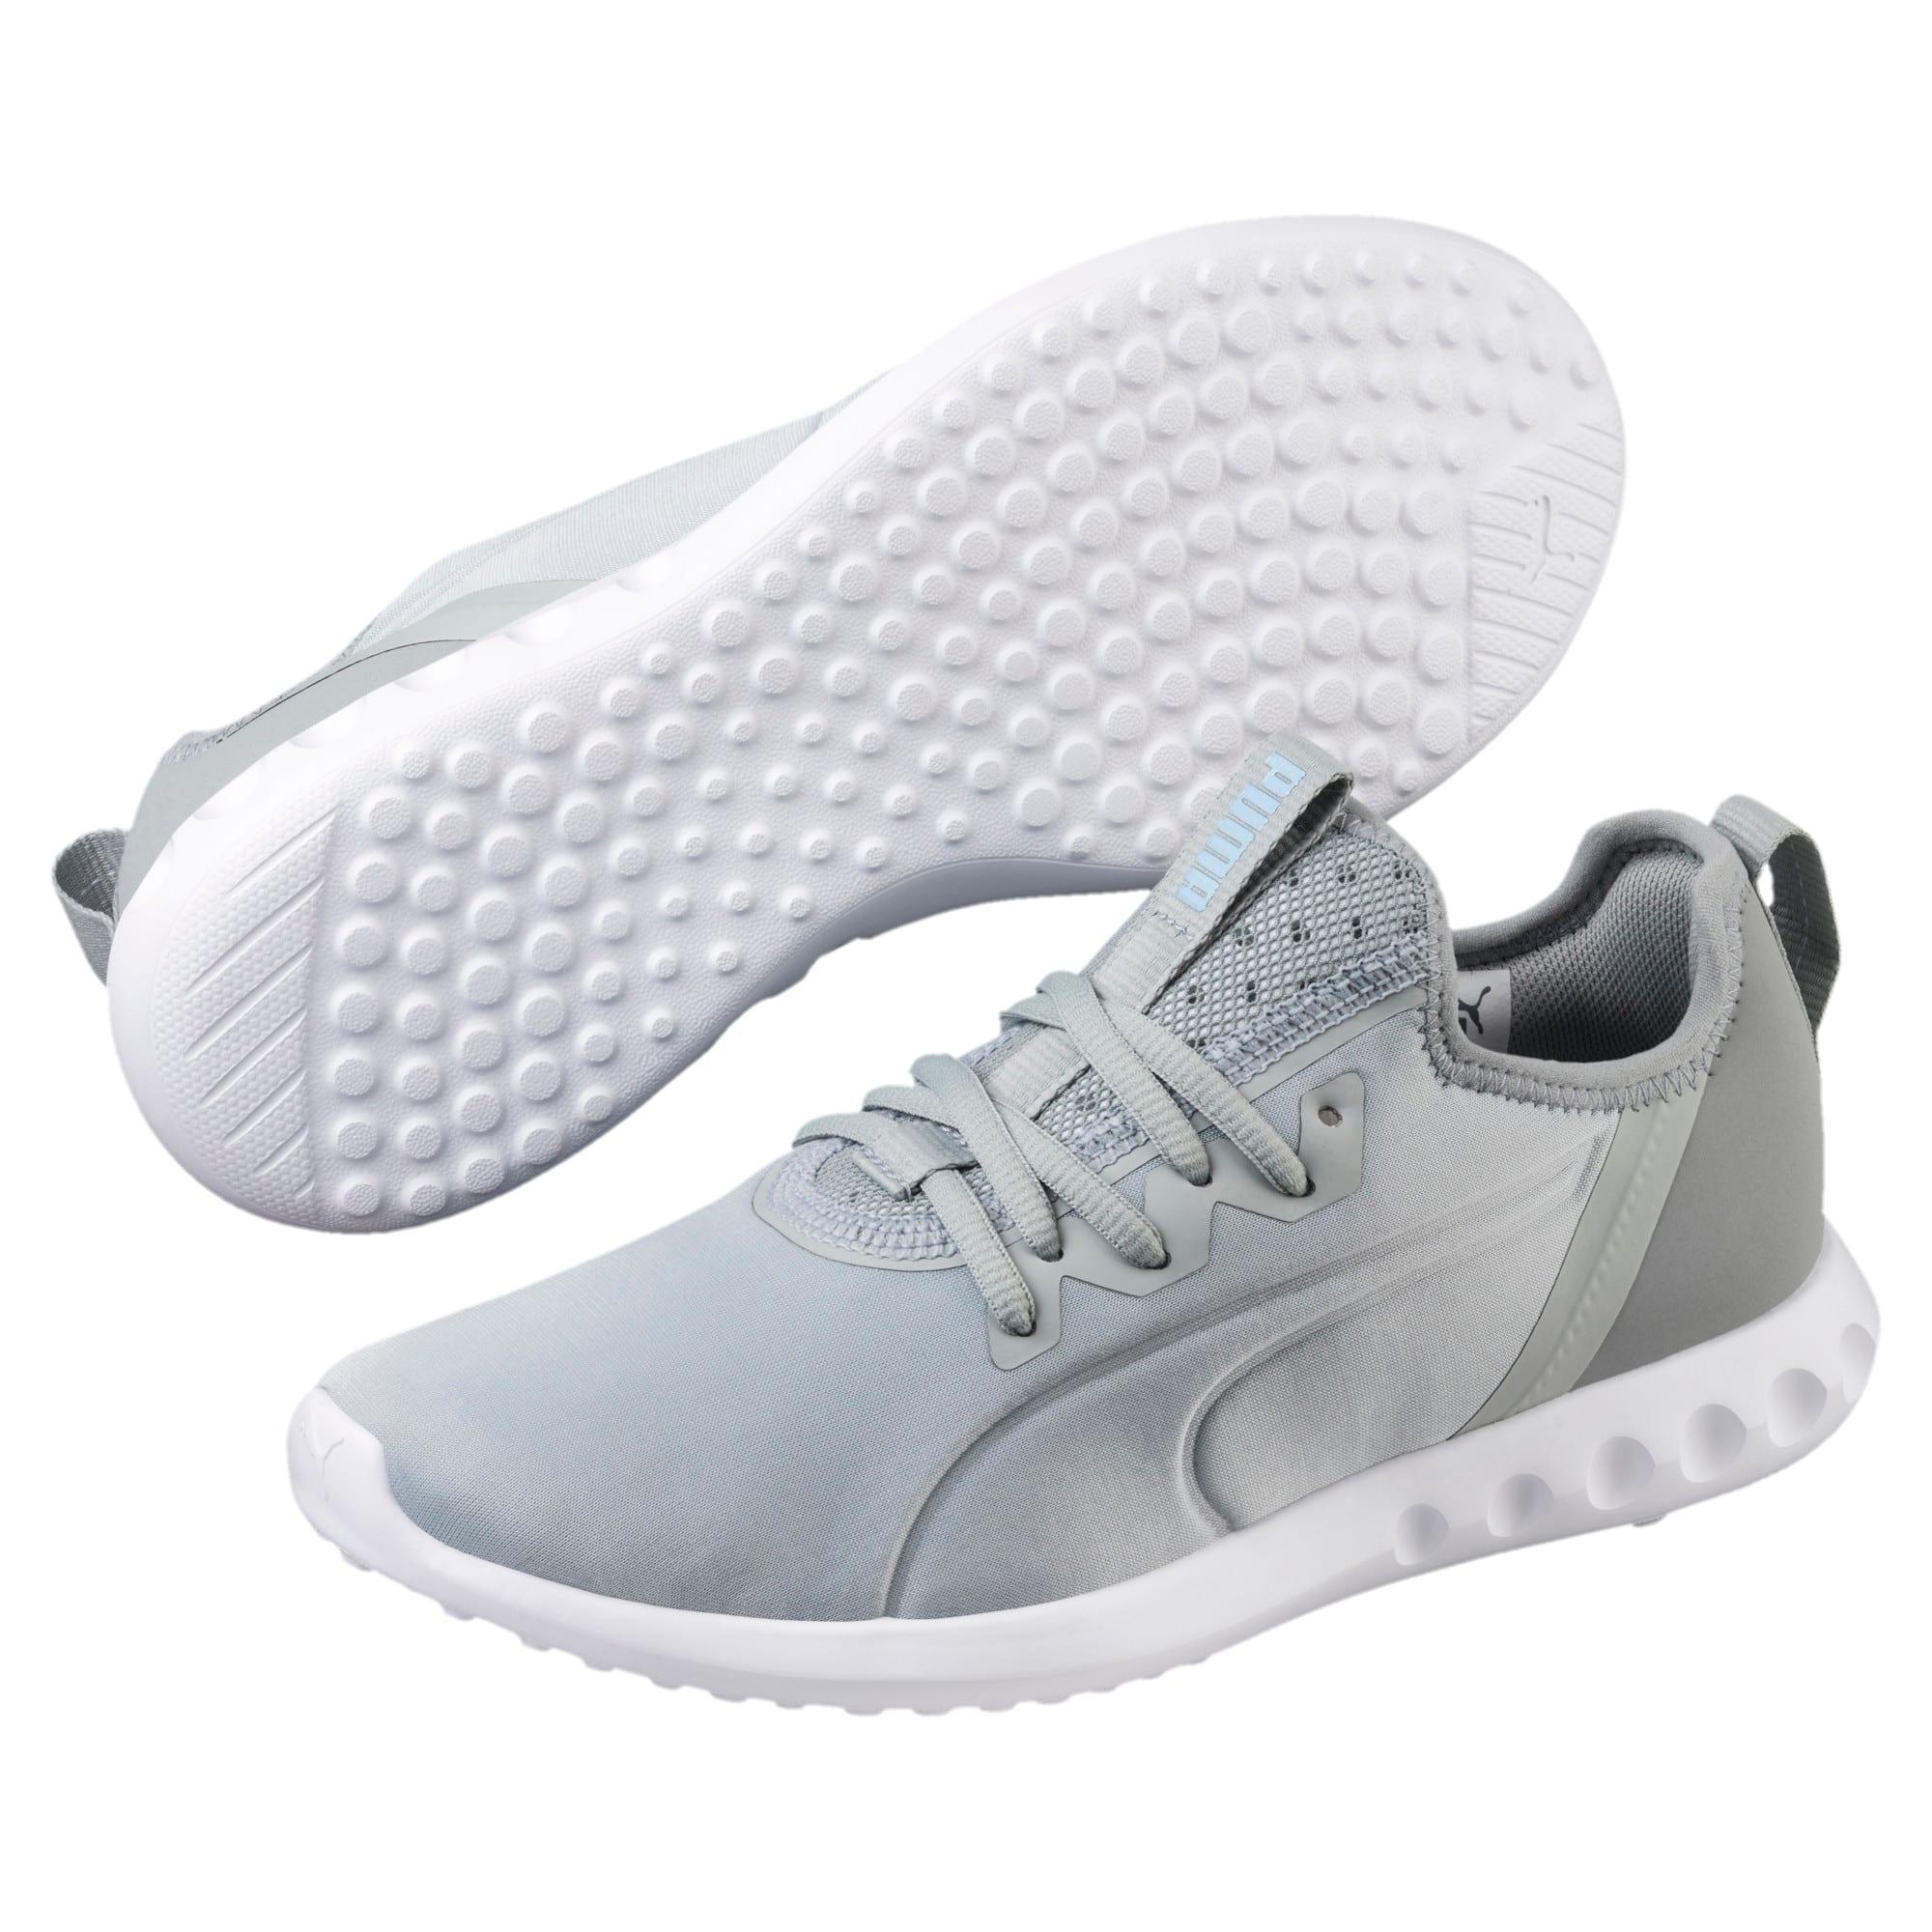 Thumbnail 2 of Carson 2 X Women's Running Shoes, Quarry-CERULEAN, medium